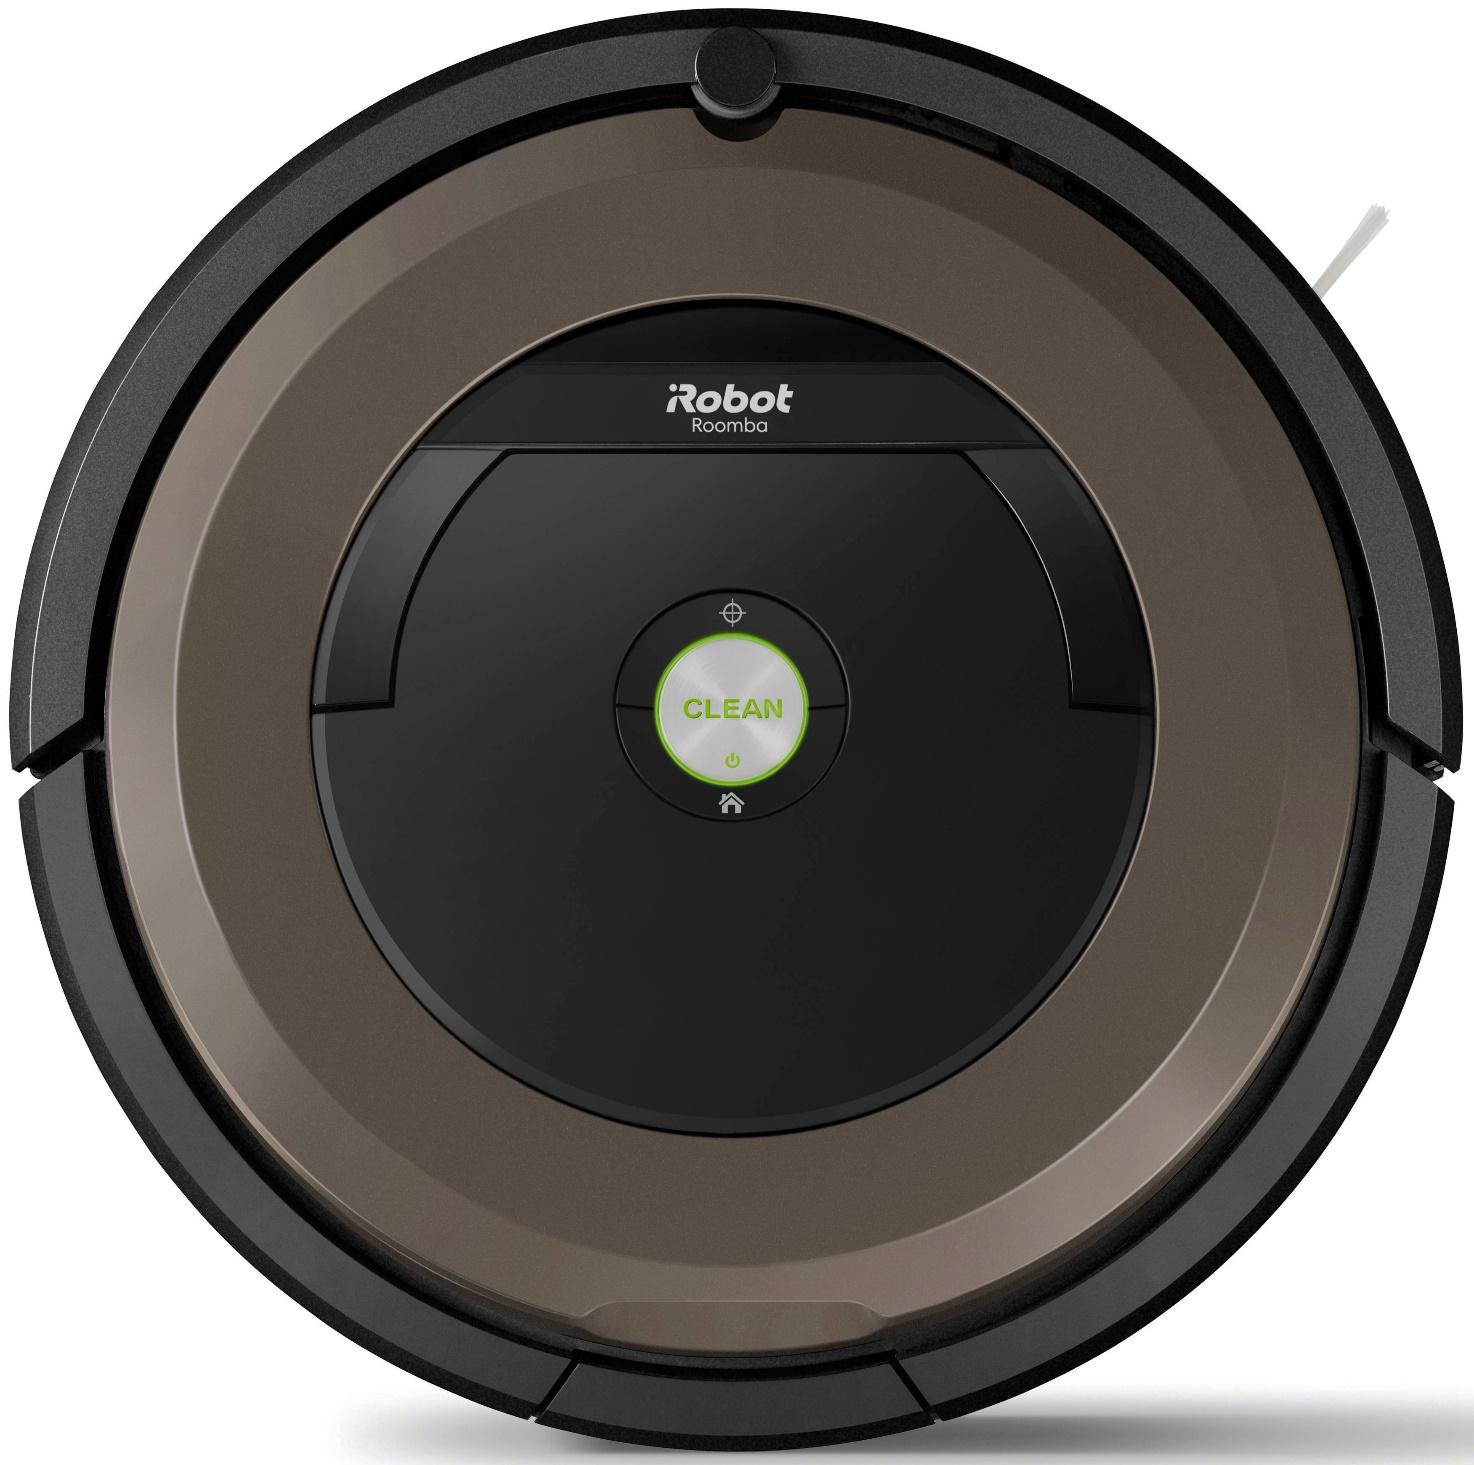 iRobot Roomba 890 top